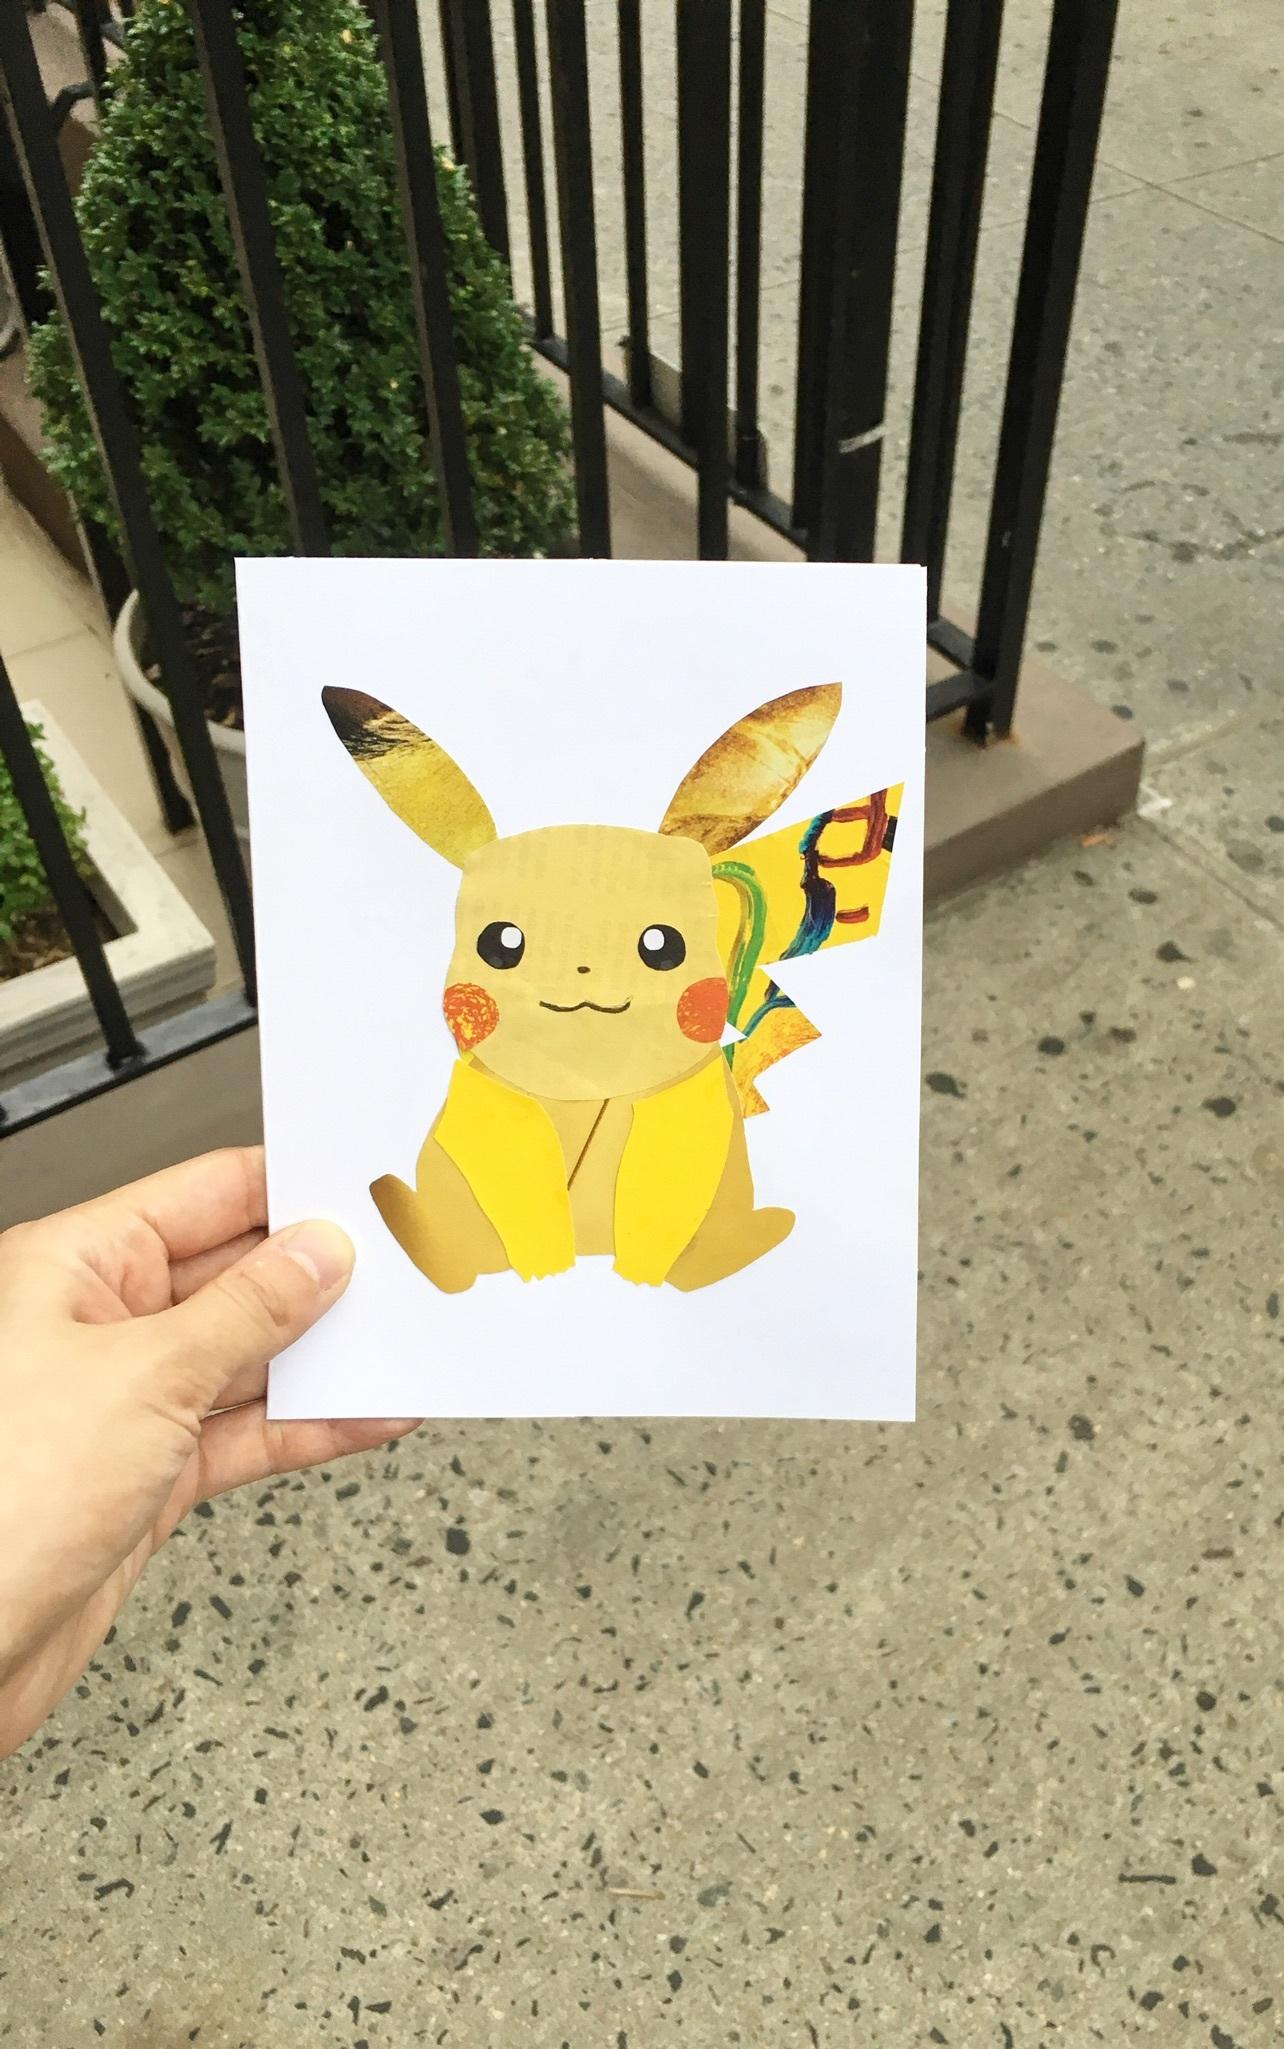 Pikachu in the Wild